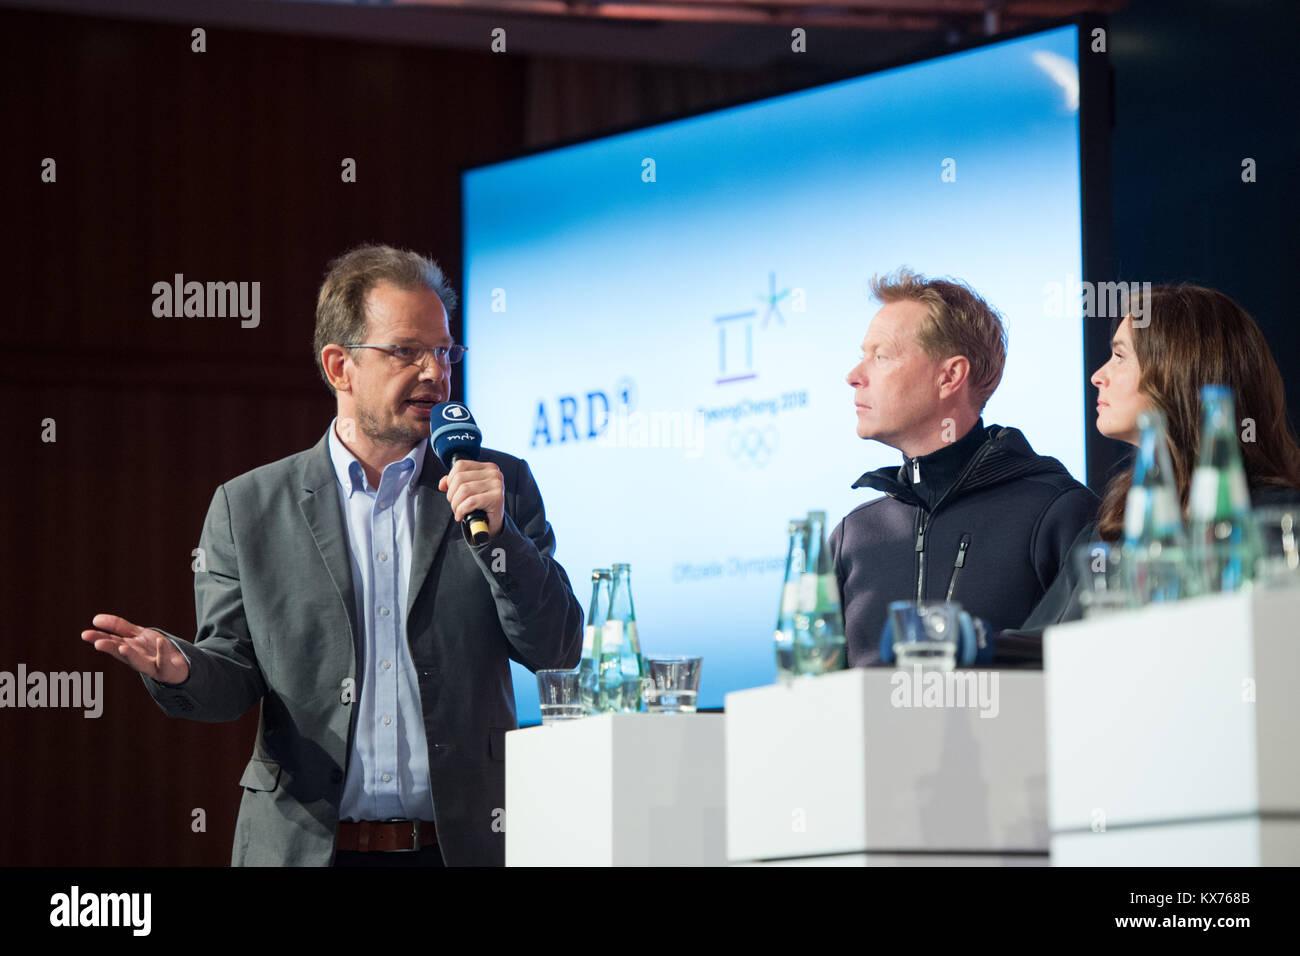 vl: Hajo SEPPELT (ARD Doping-Experte), Dieter THOMA (ARD Skisprung-Experte) und Katarina WITT (ARD Olympia-Expertin) Stock Photo